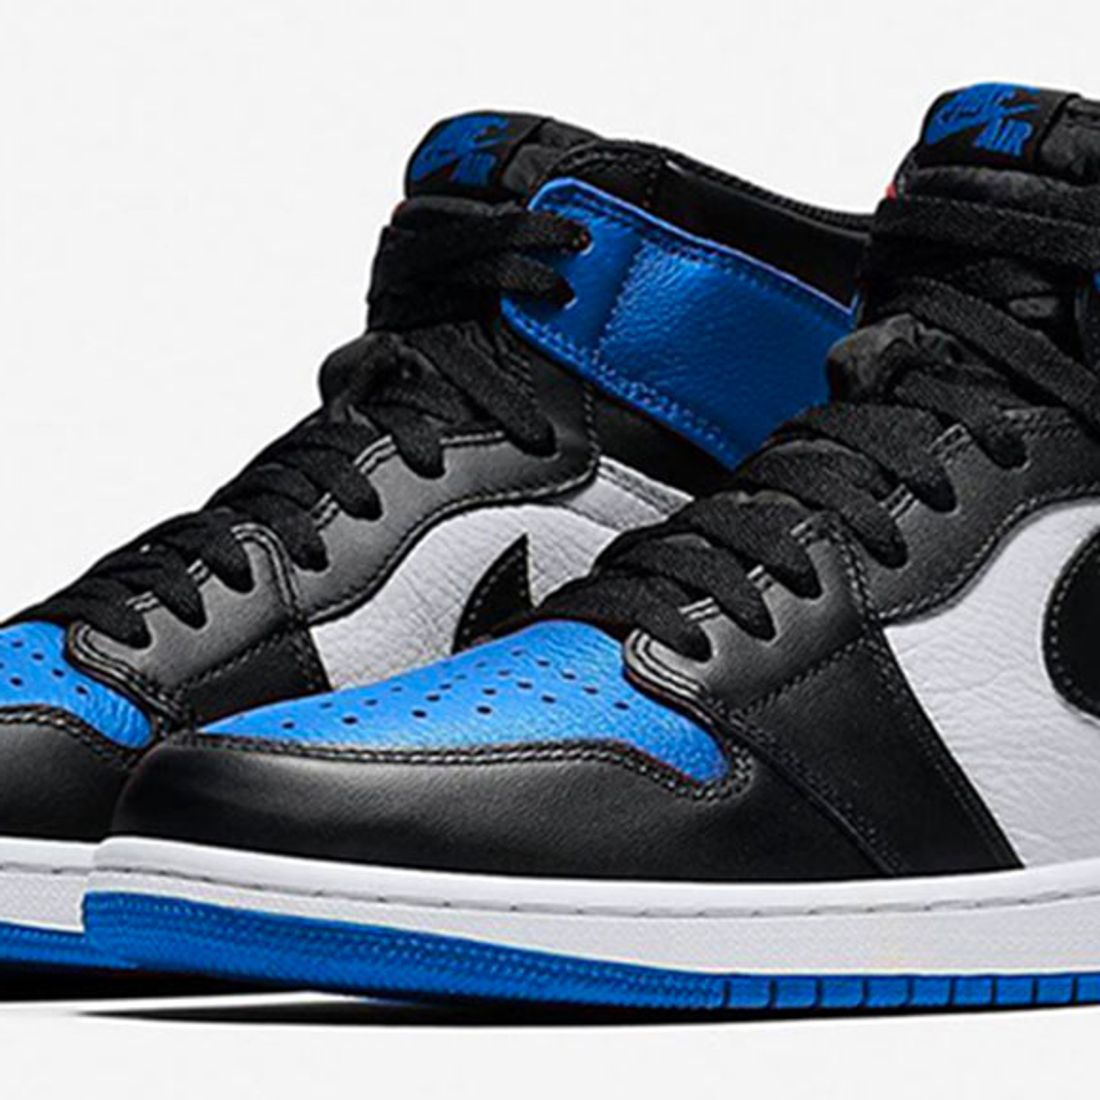 You Ready For The Air Jordan 1 Royal Toe Sneaker Freaker